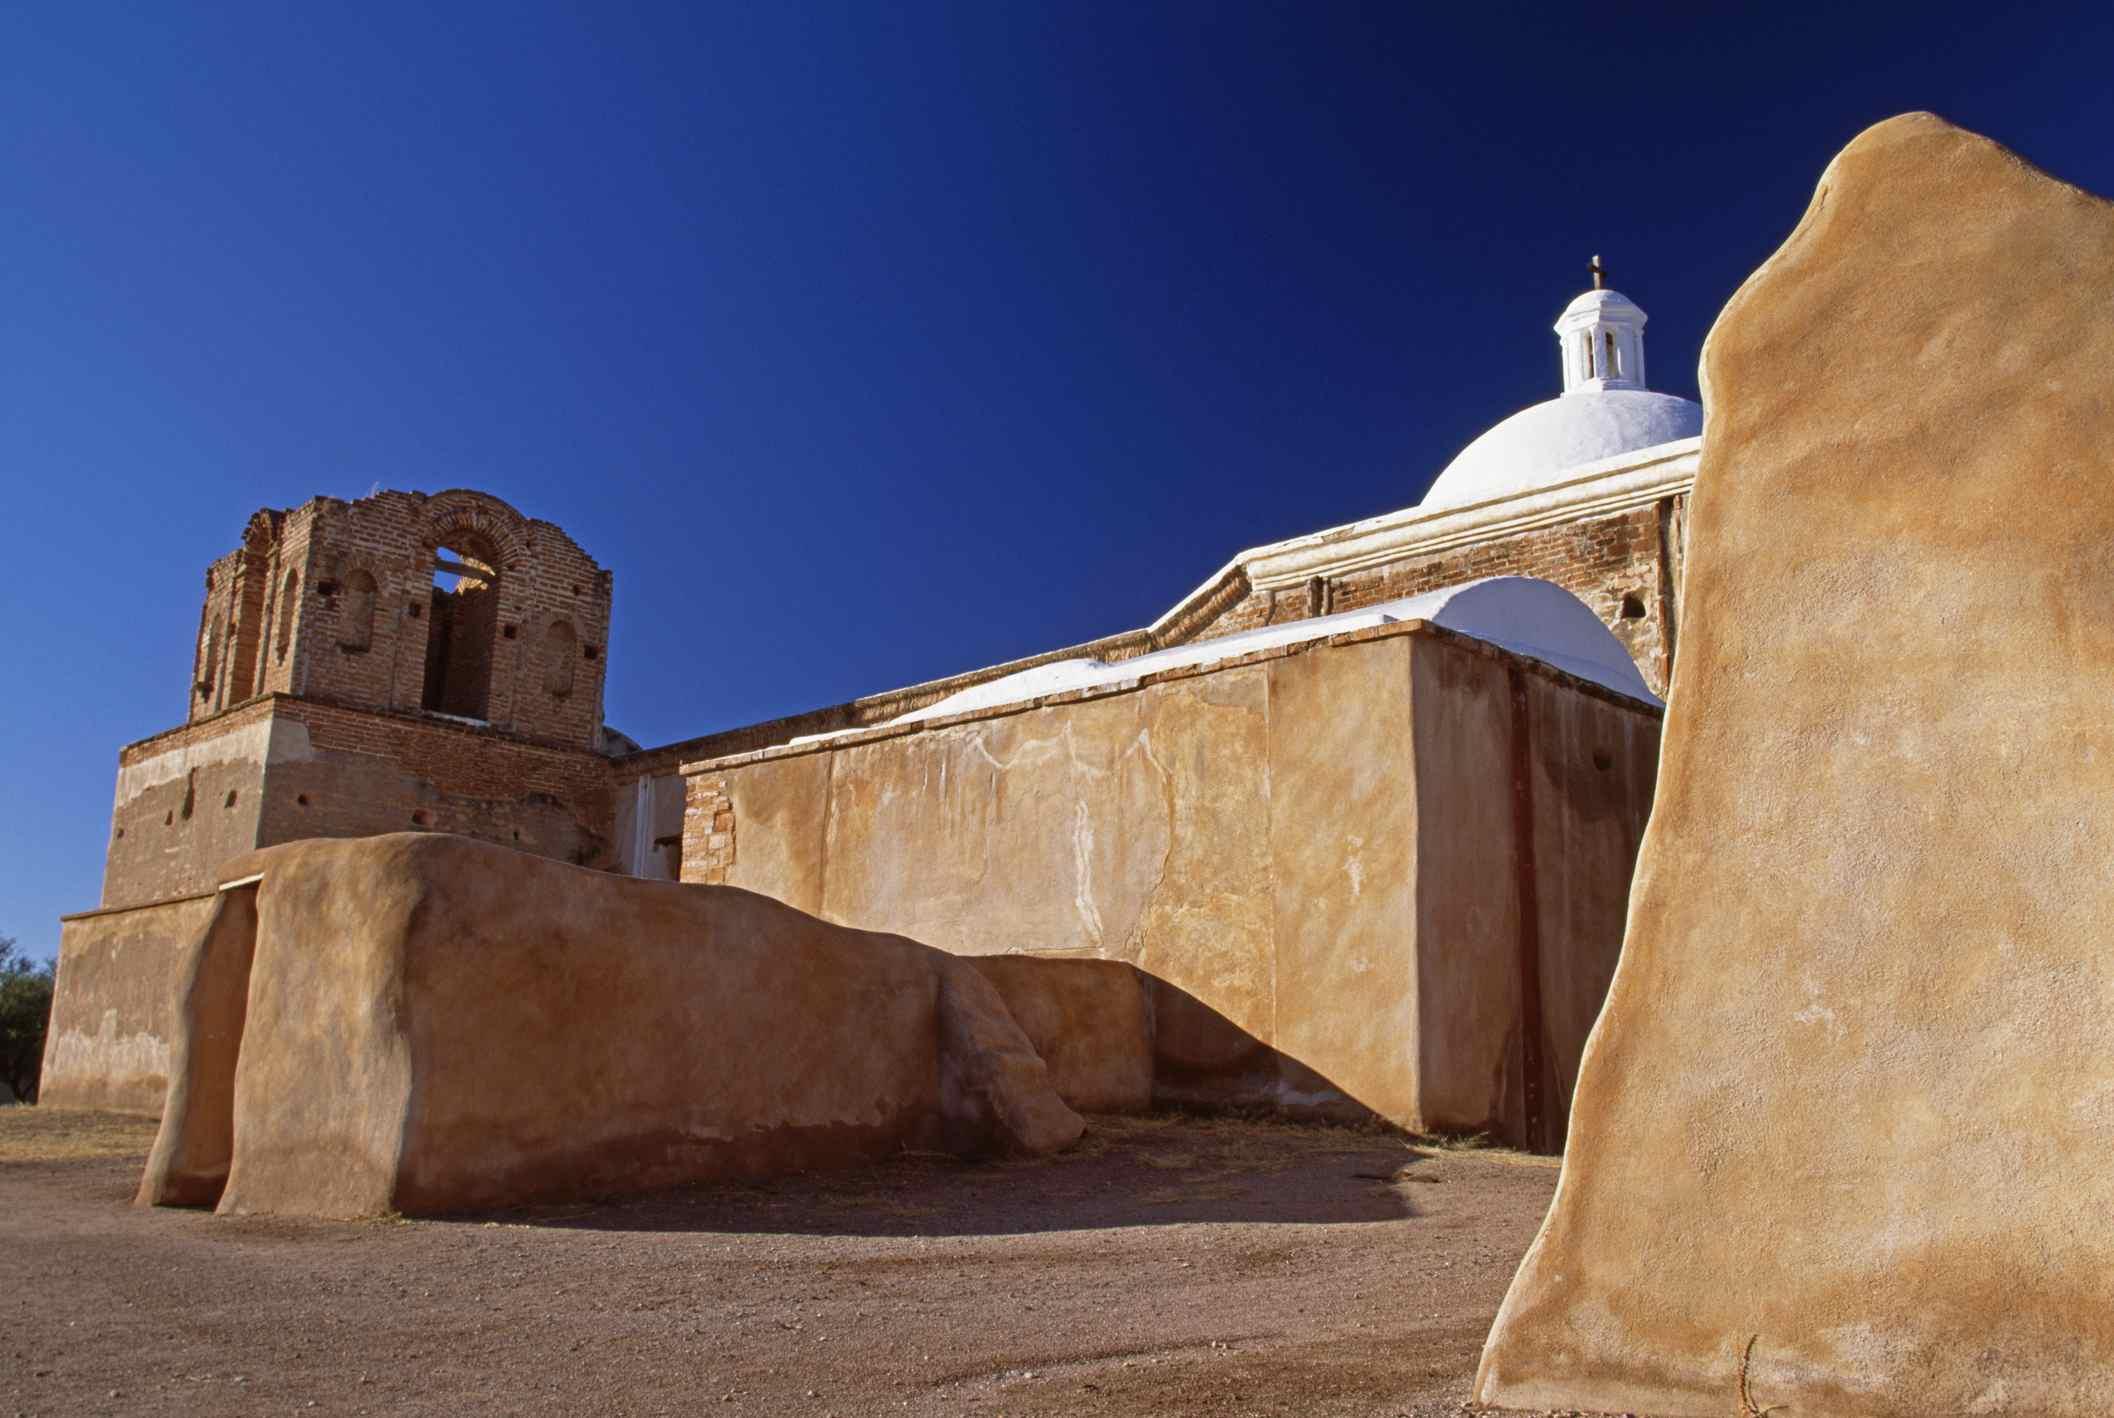 Ruins of Spanish Mission at Tumacacori National Historic Park